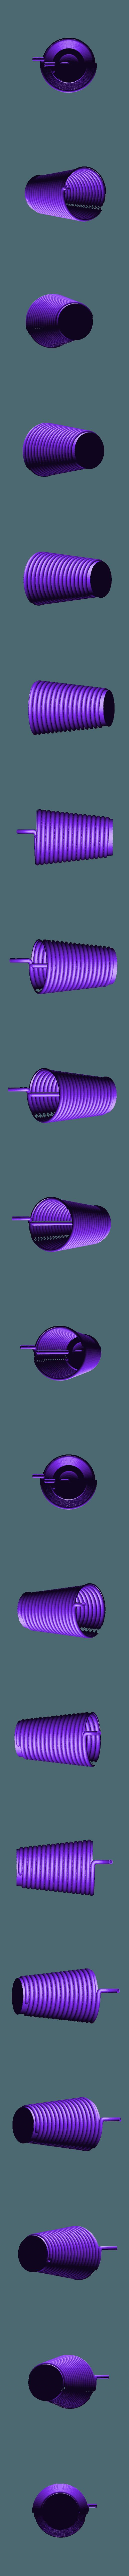 straw-glass-practical-v3-beta.stl Download free STL file Big StrawGlass - Practical • 3D print design, bLiTzJoN